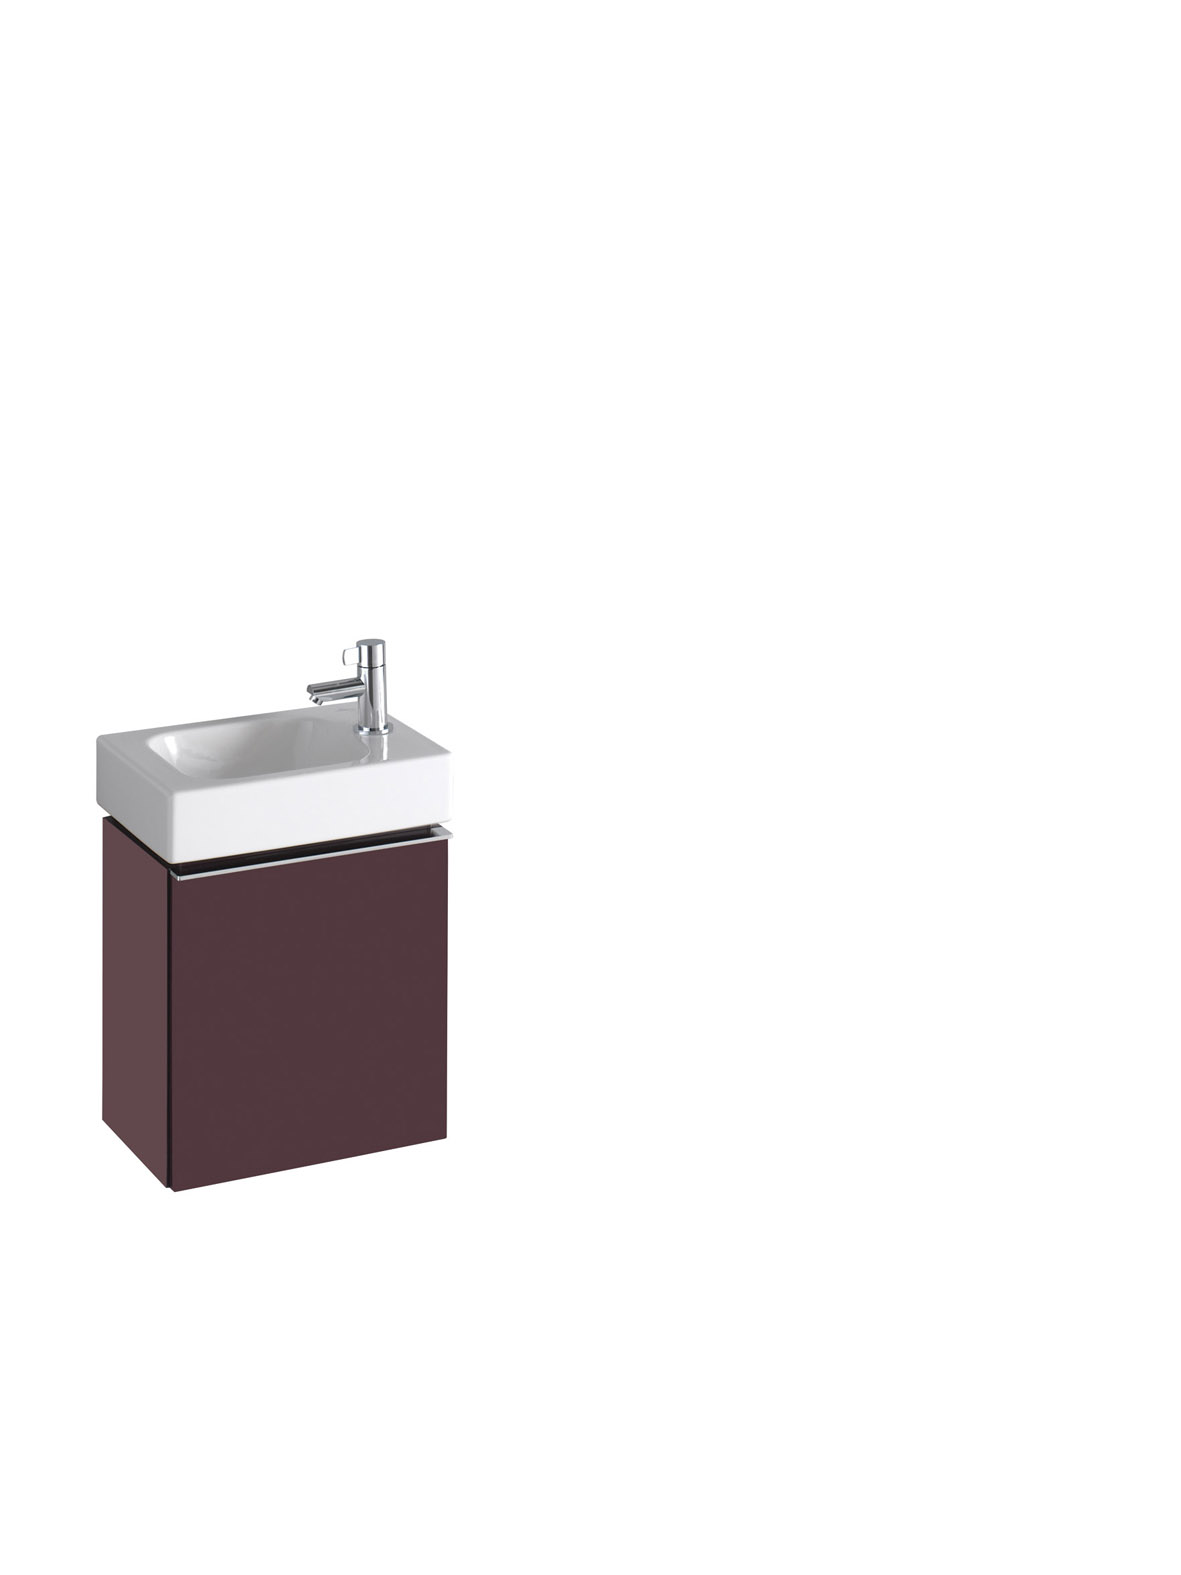 koupelnový nábytek KERAMAG Icon 38 cm burgundy